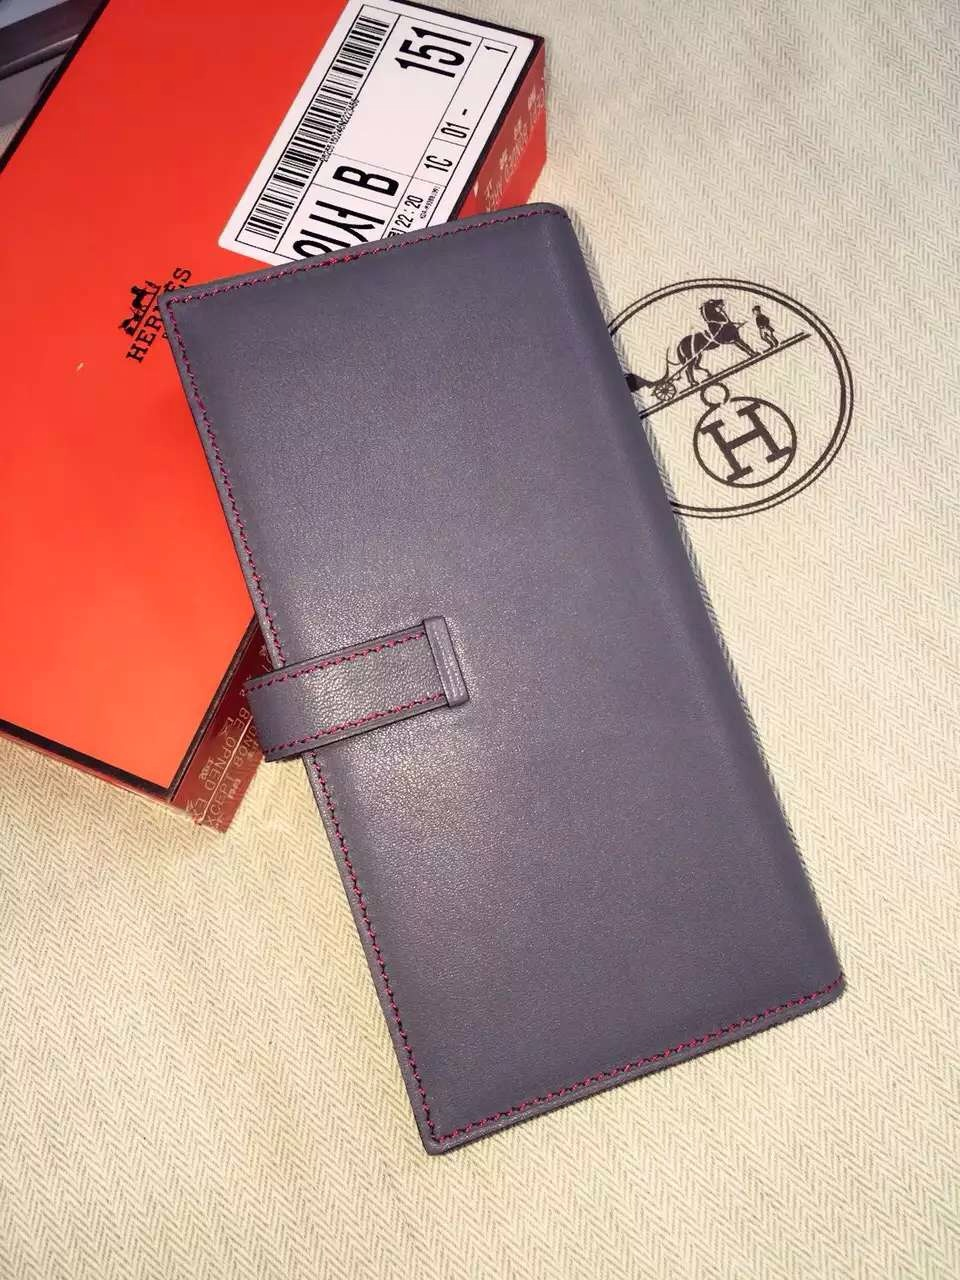 19CM Hermes Swift Leather CK18 Etoupe Grey Bean Wallet Clutch Handbag